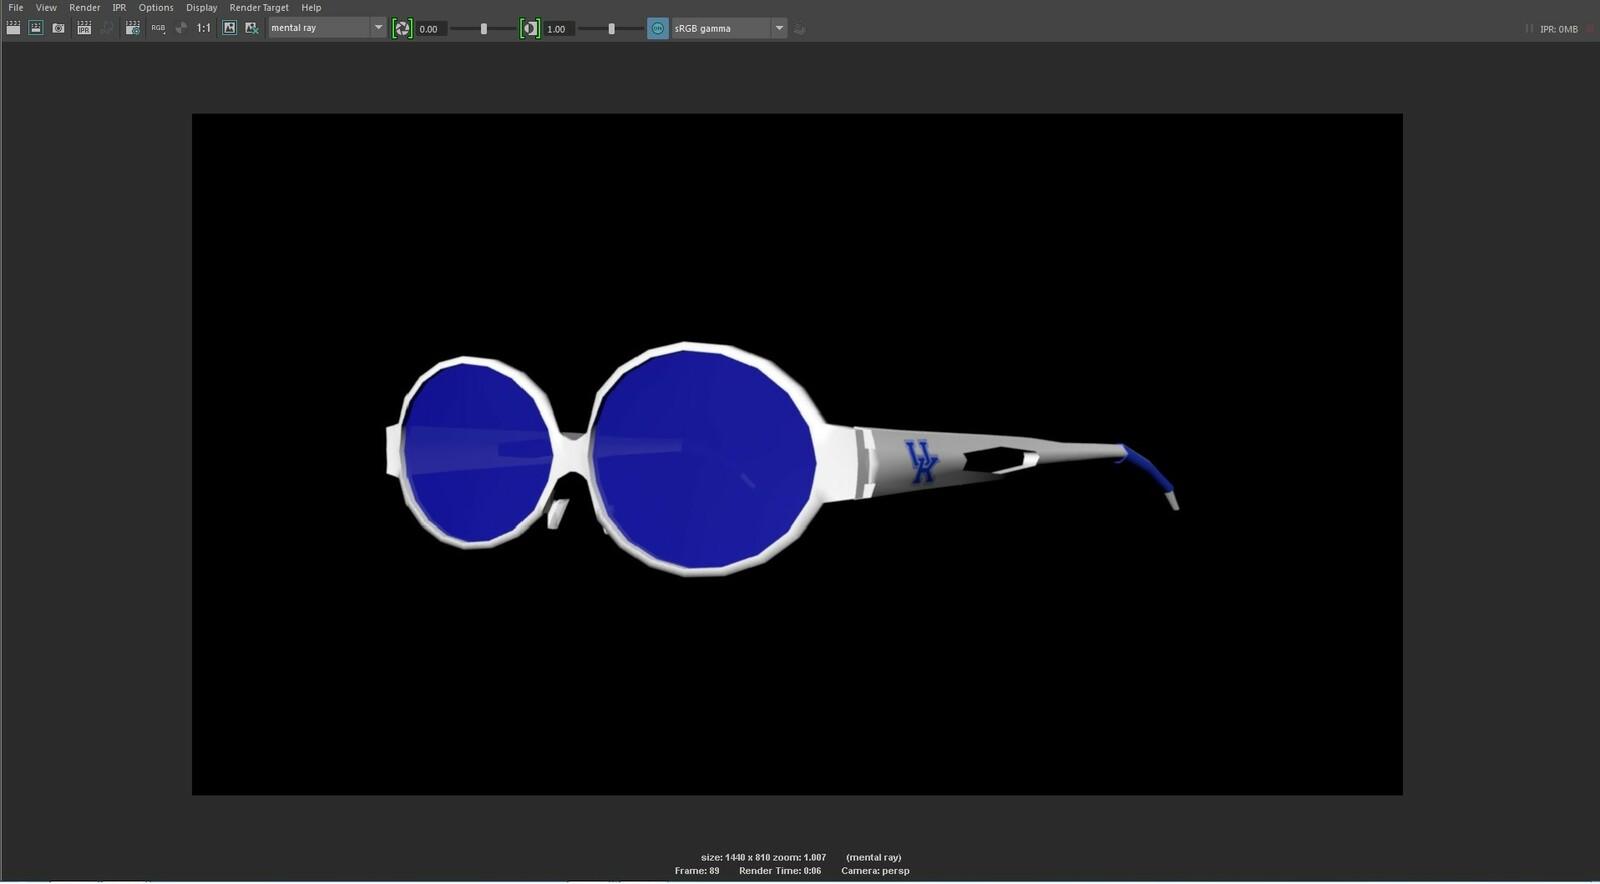 The final 3D model of the UK Sunglasses